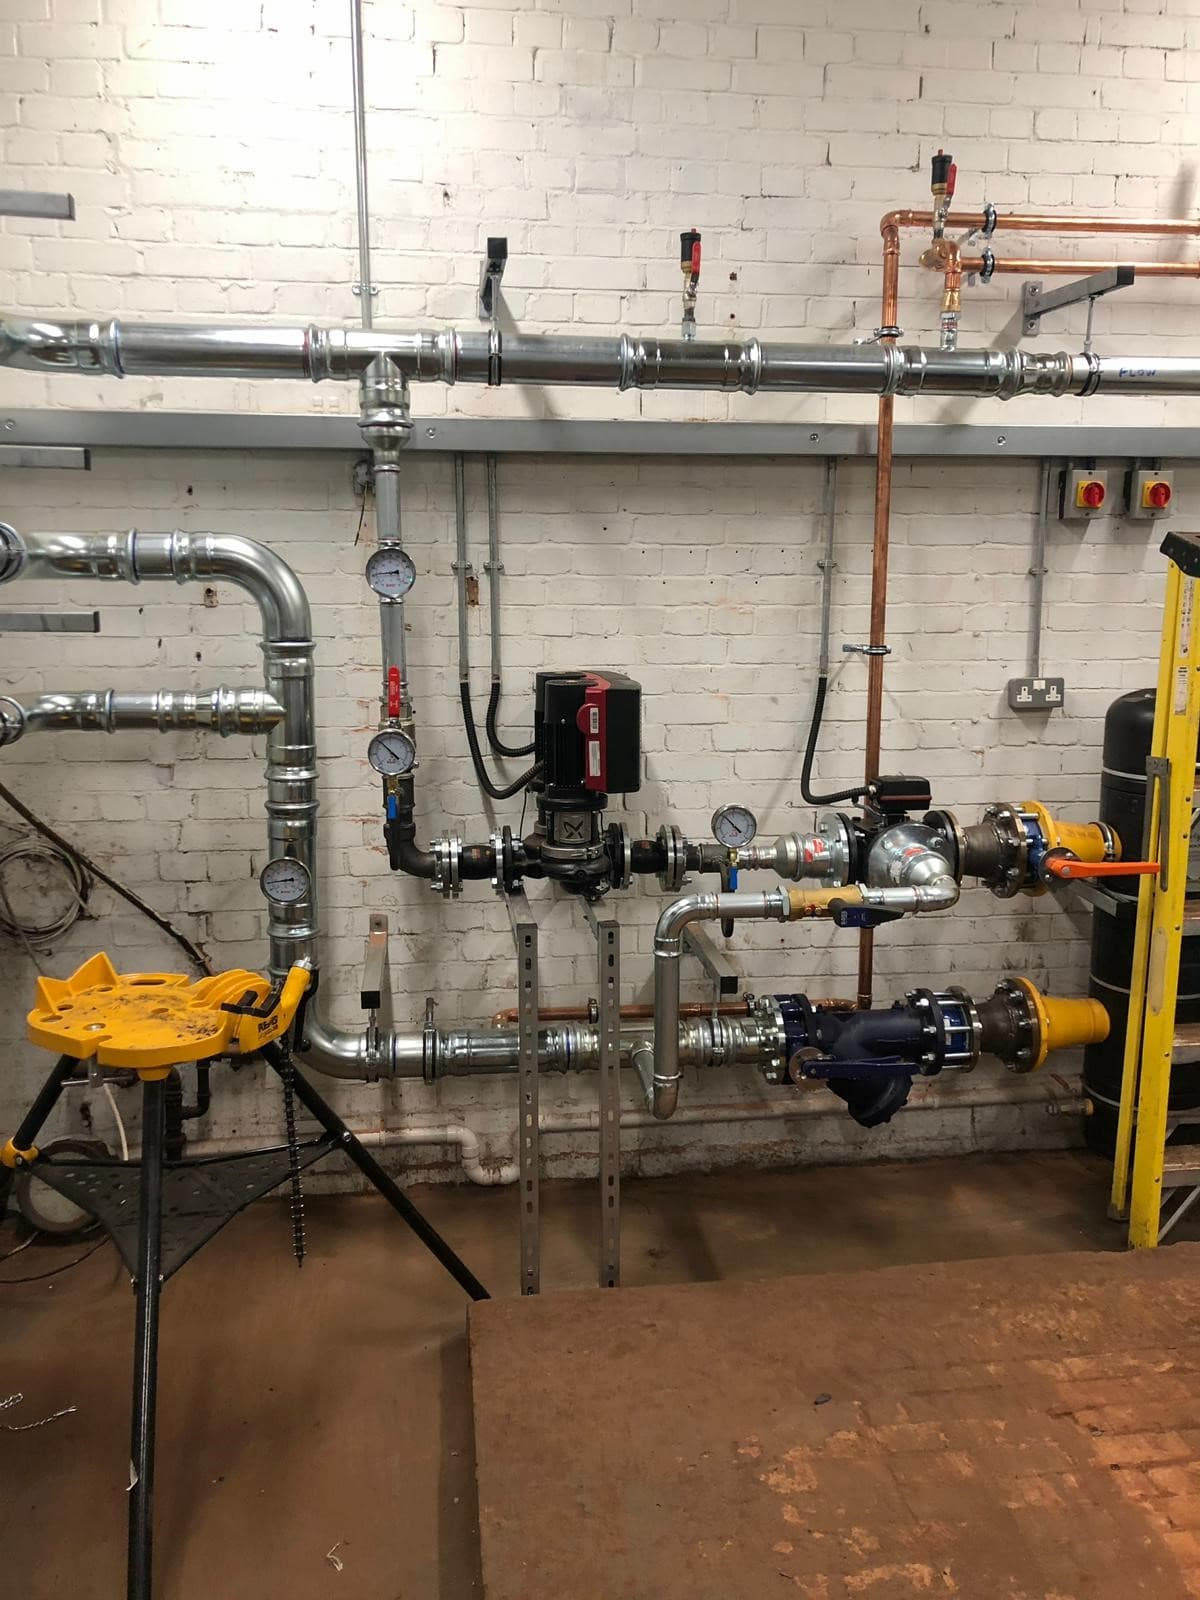 Commercial hydraulic machine